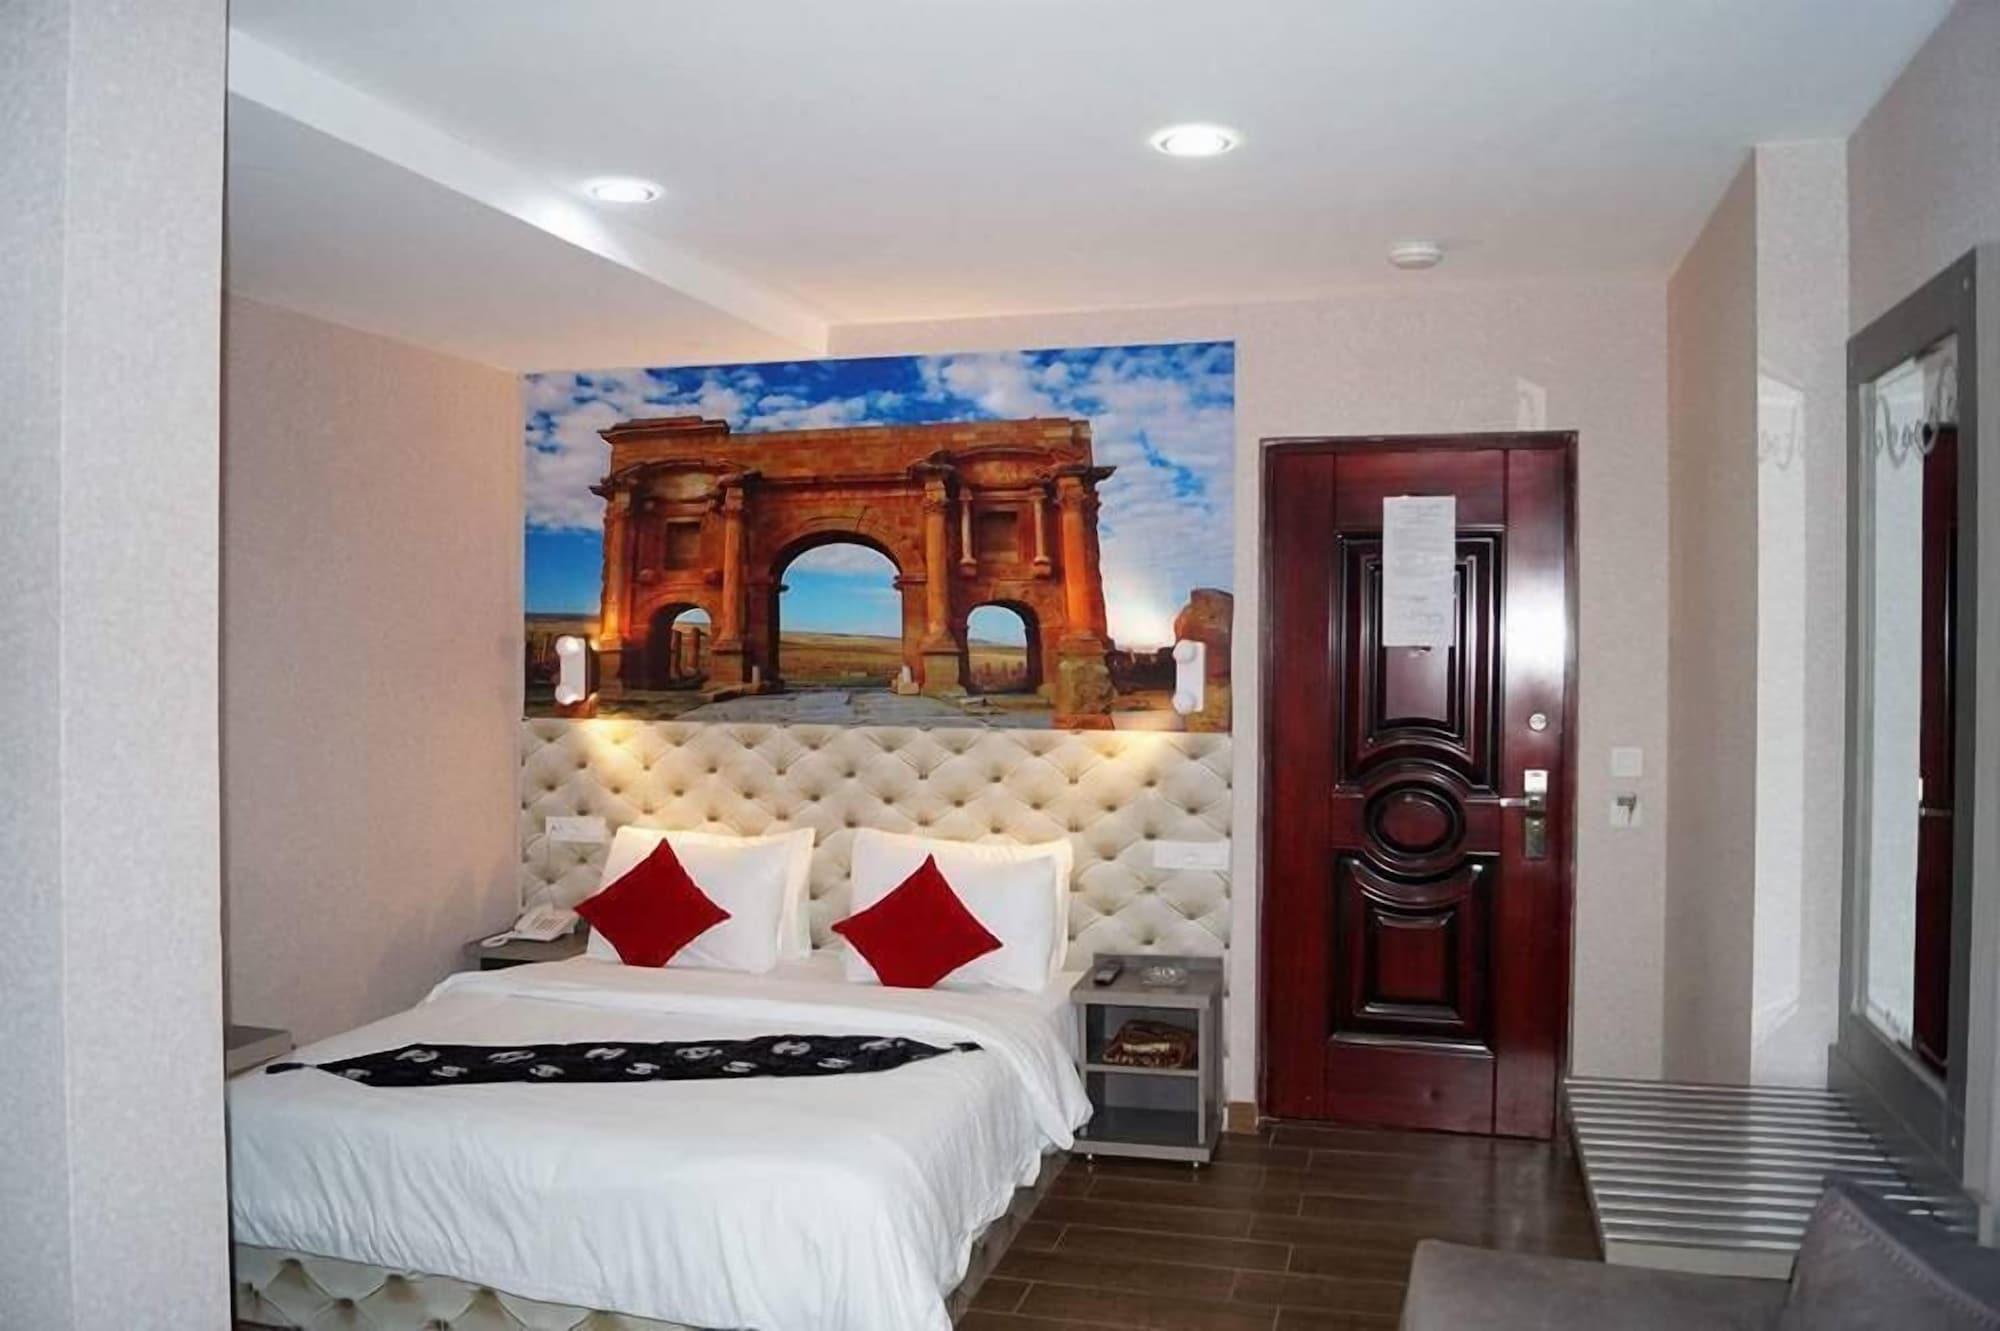 Timgad Hotel Hazem, Batna